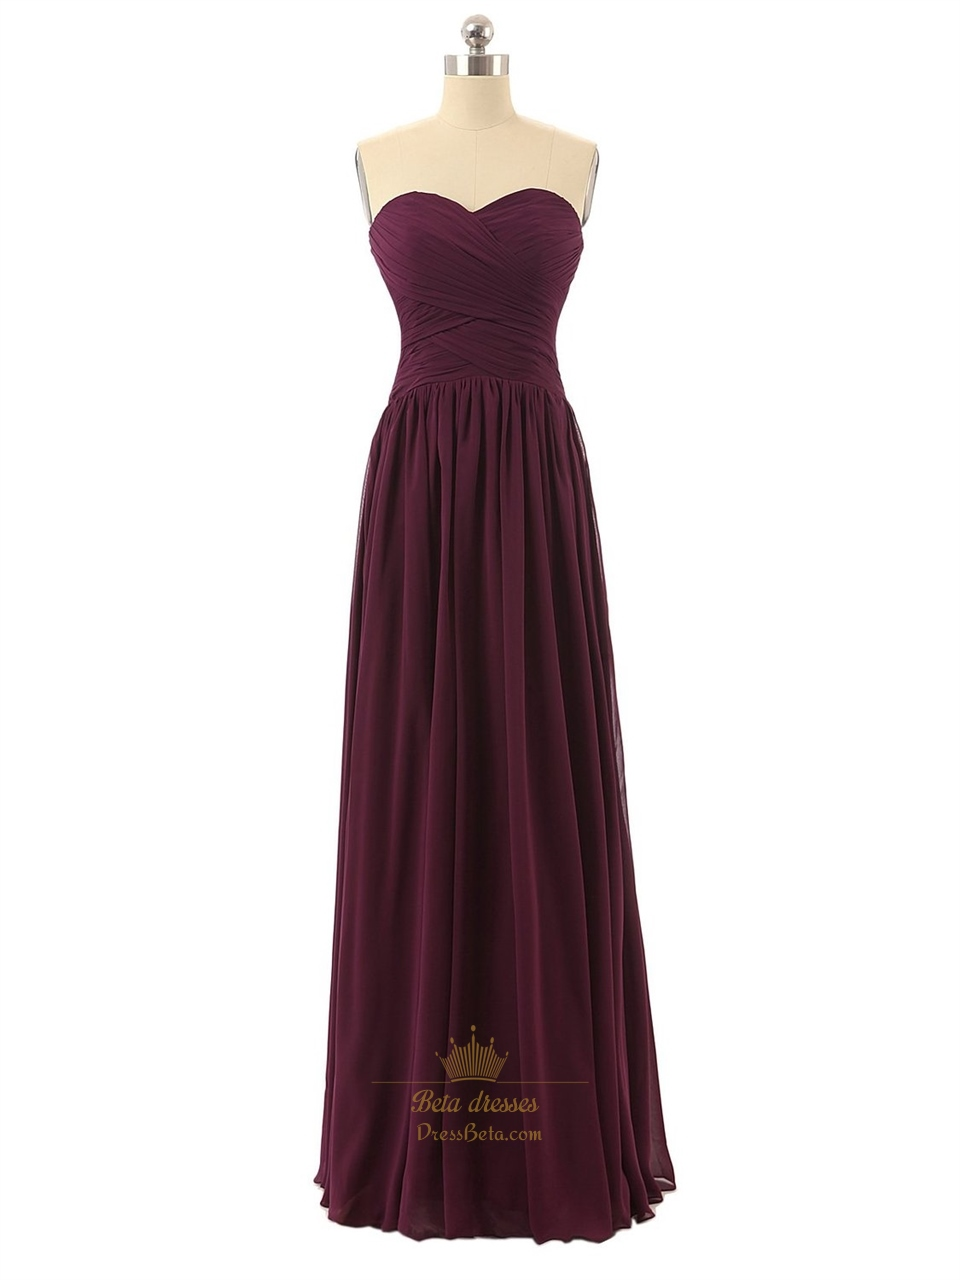 Burgundy Sweetheart Chiffon Bridesmaid Dress With Criss-Cross Bodice | Next Prom Dresses